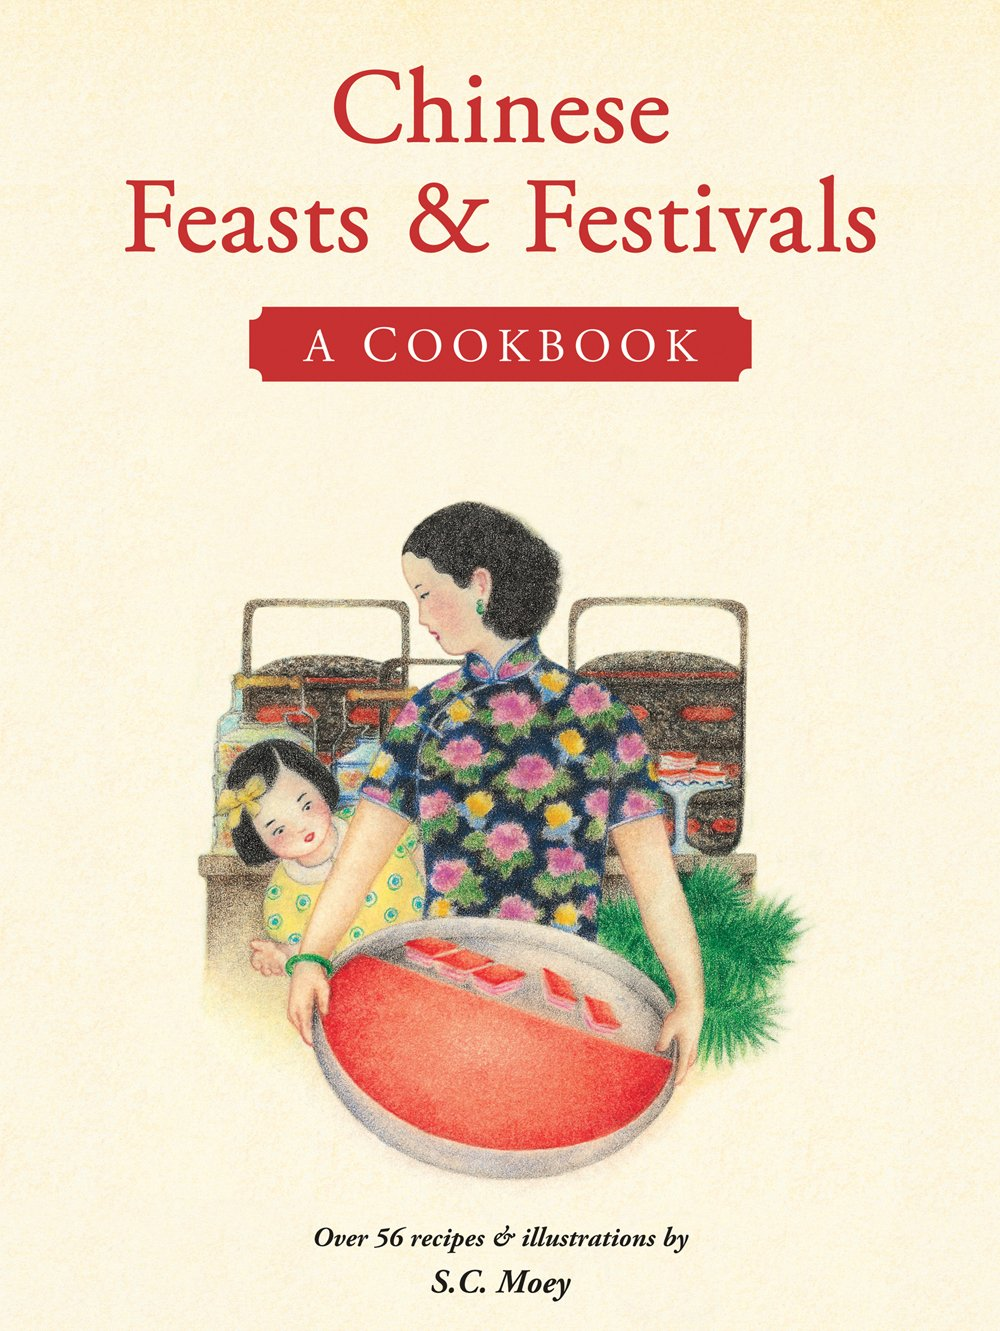 Cookbook Giveaway!!!